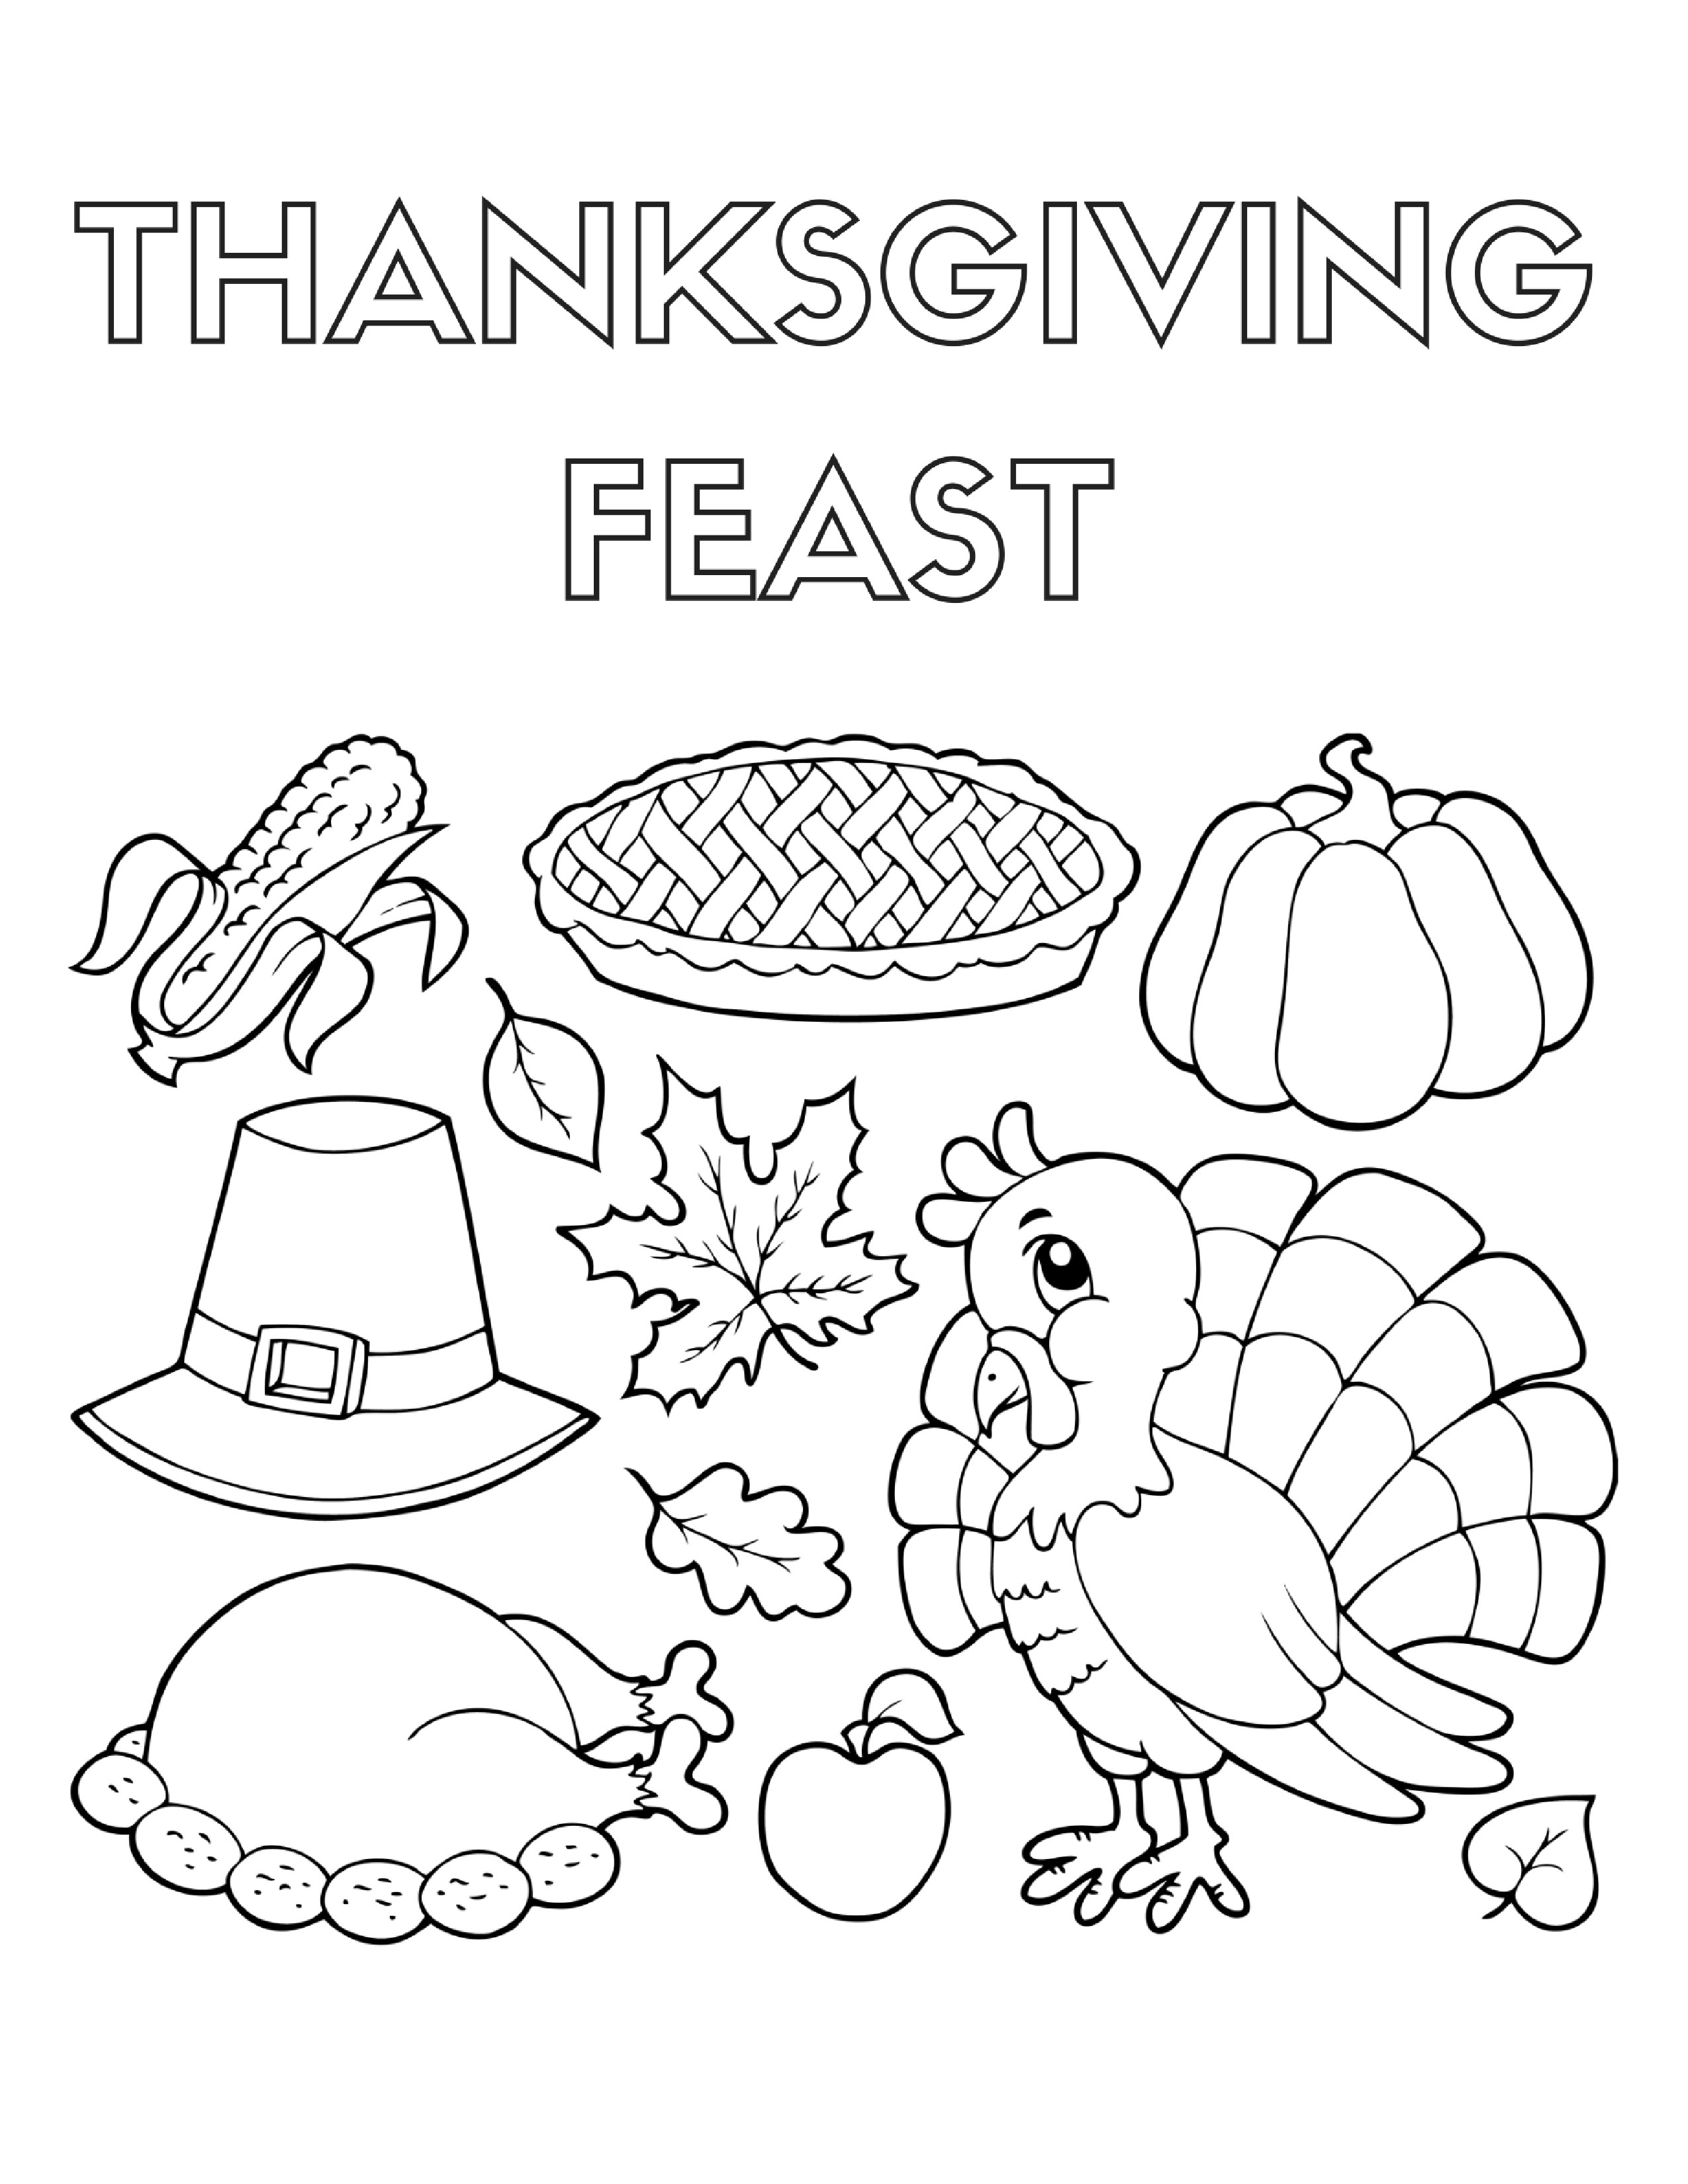 Thanksgiving Food Drawing At Getdrawings